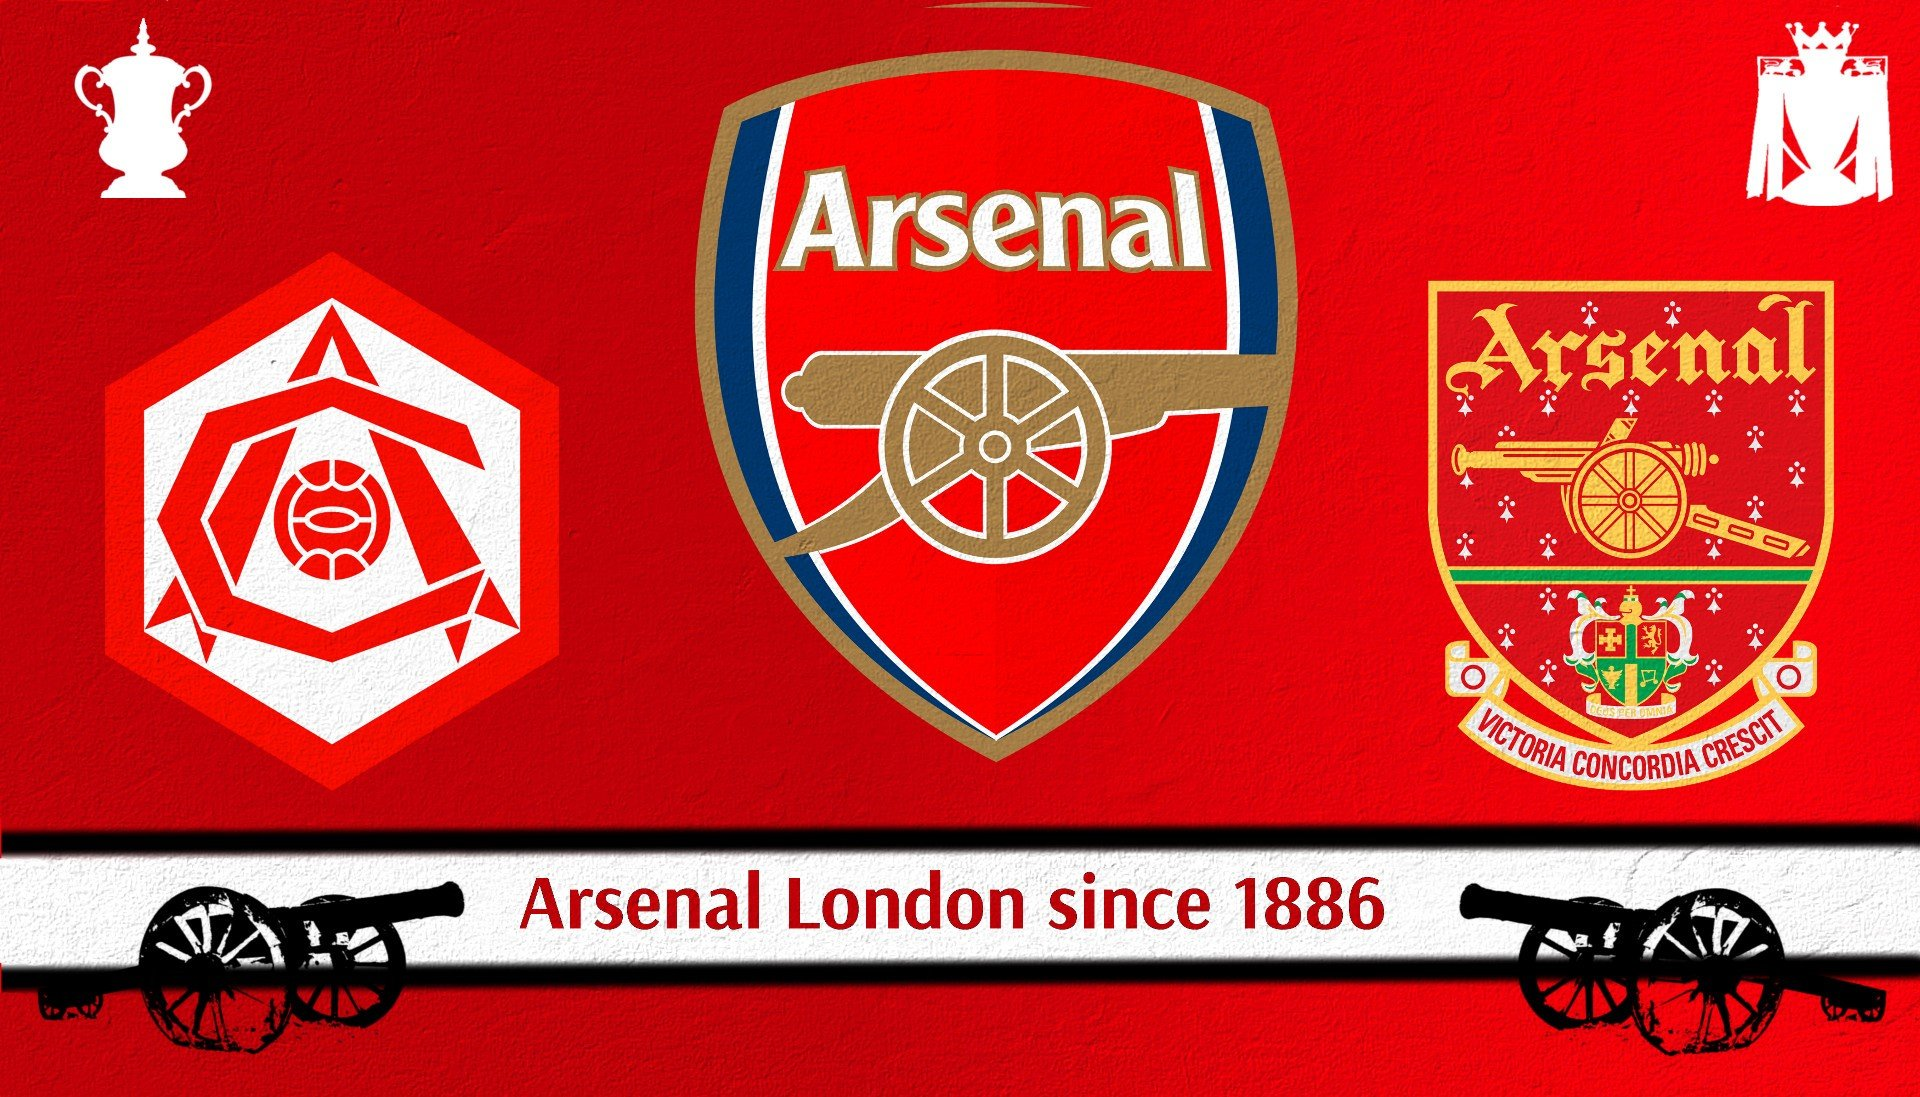 Arsenal Fc Arsenal Arsenal London London Gunners History Hd Wallpapers Desktop And Mobile Images Photos